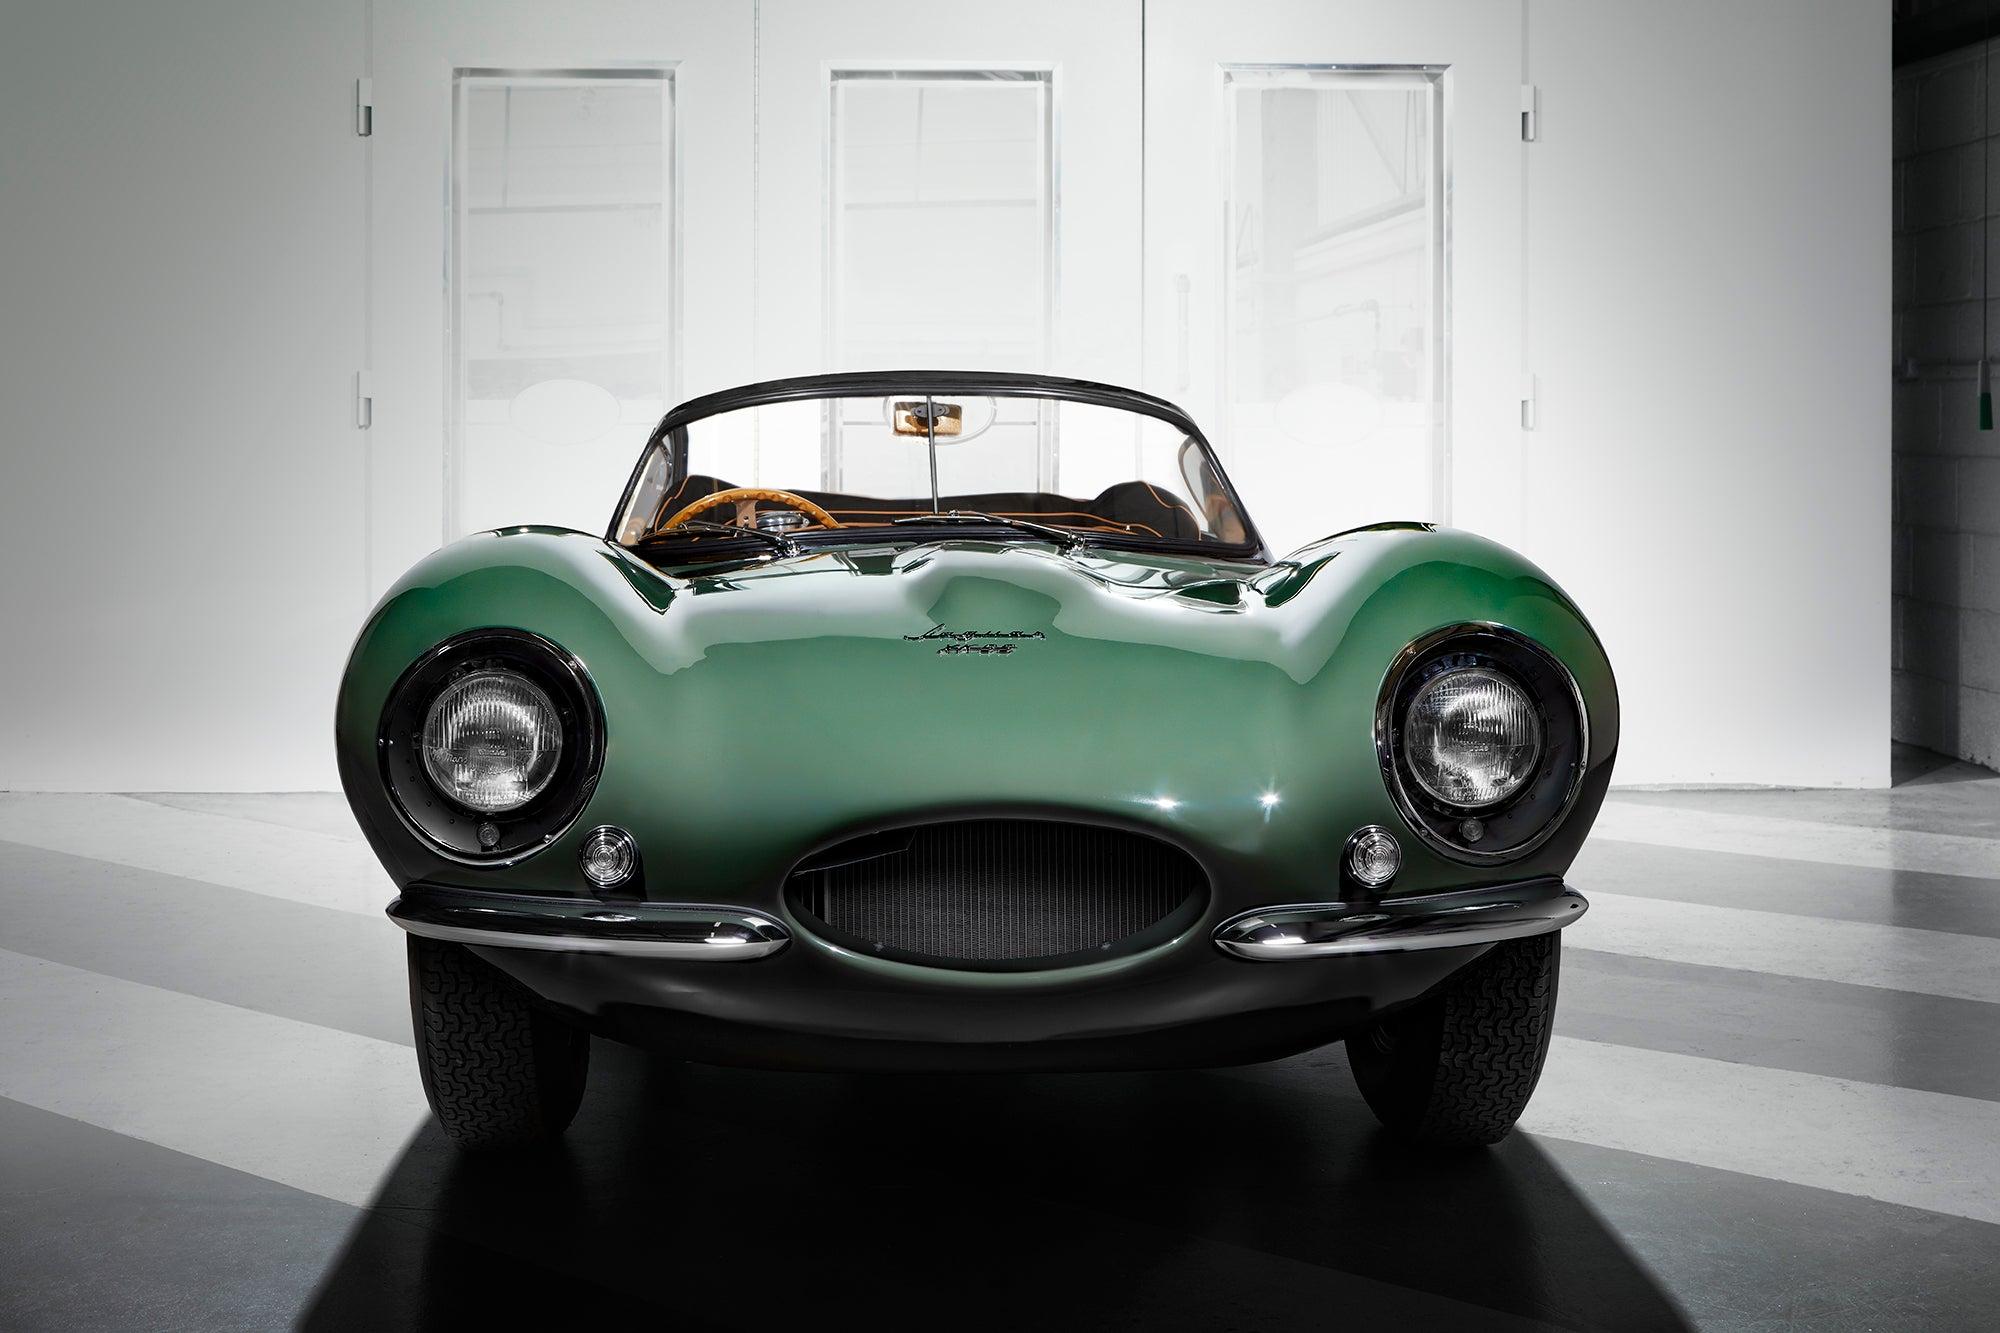 Front of recreated Jaguar XKSS